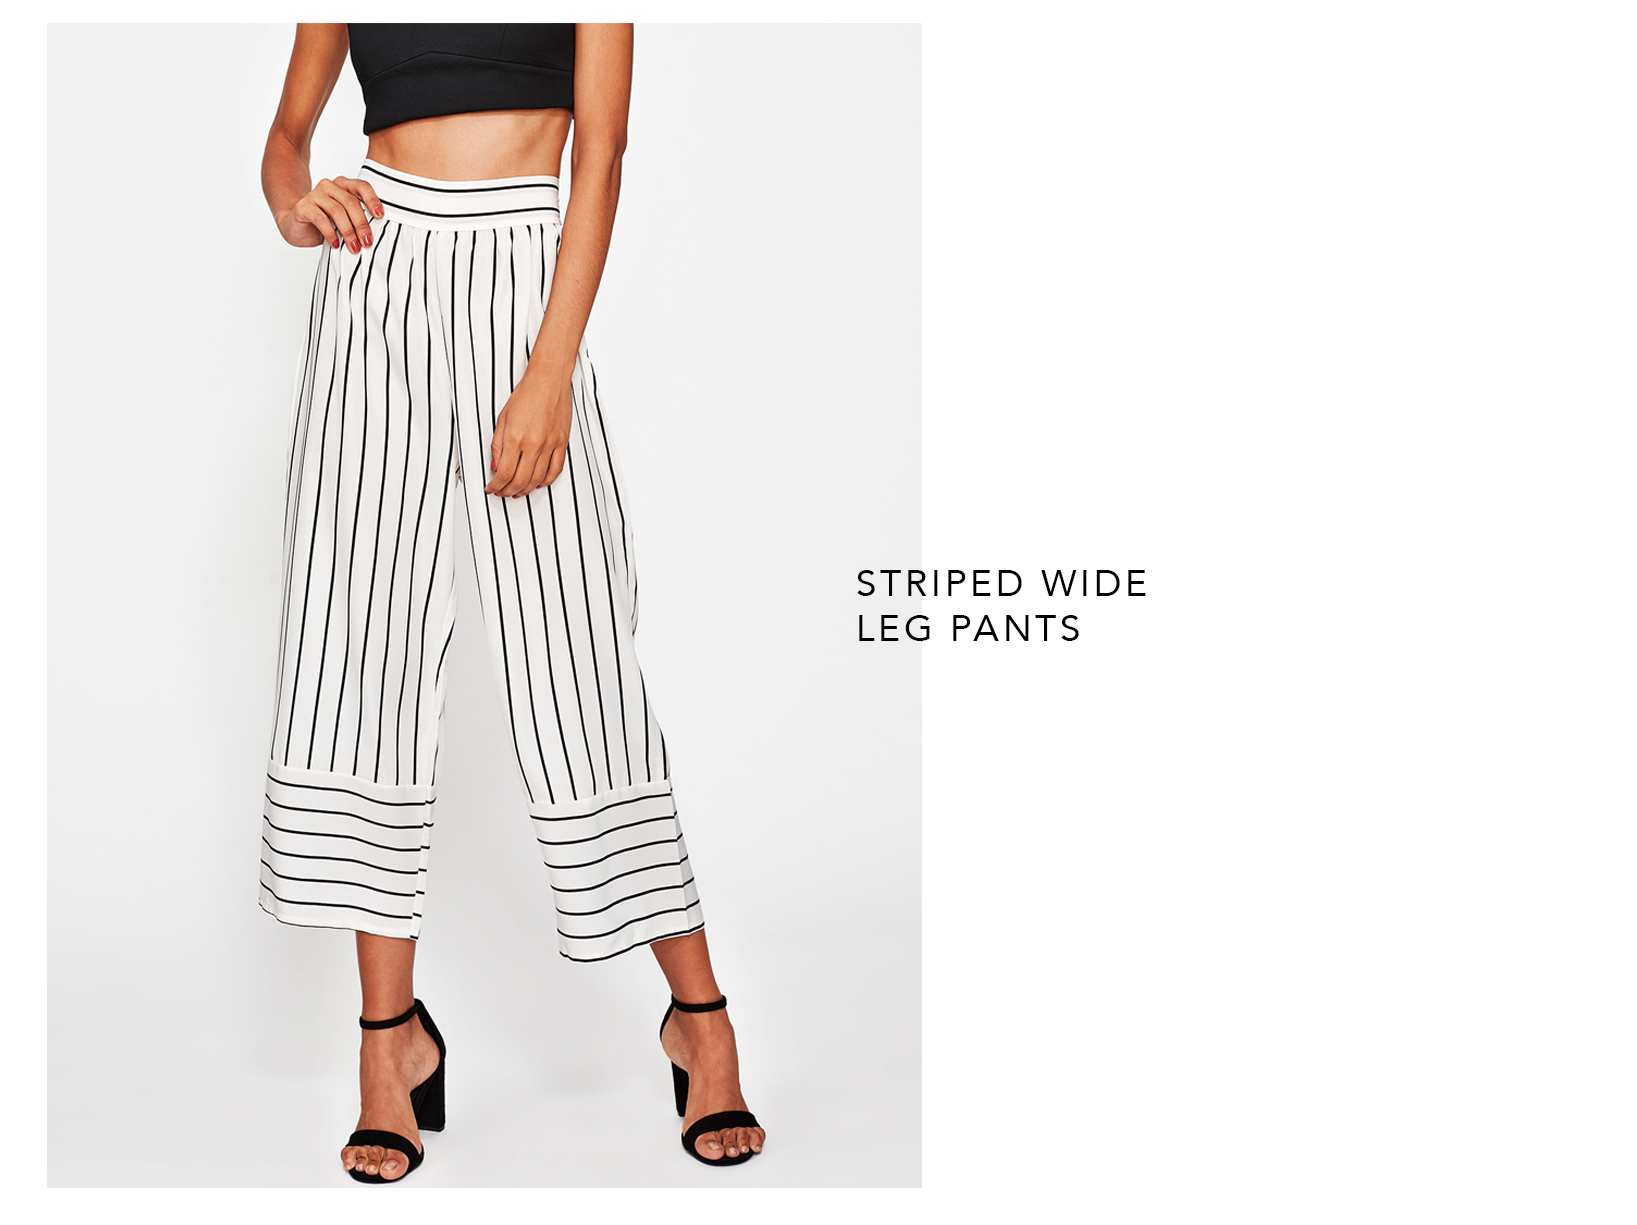 Striped Wide Leg Pants - Romwe